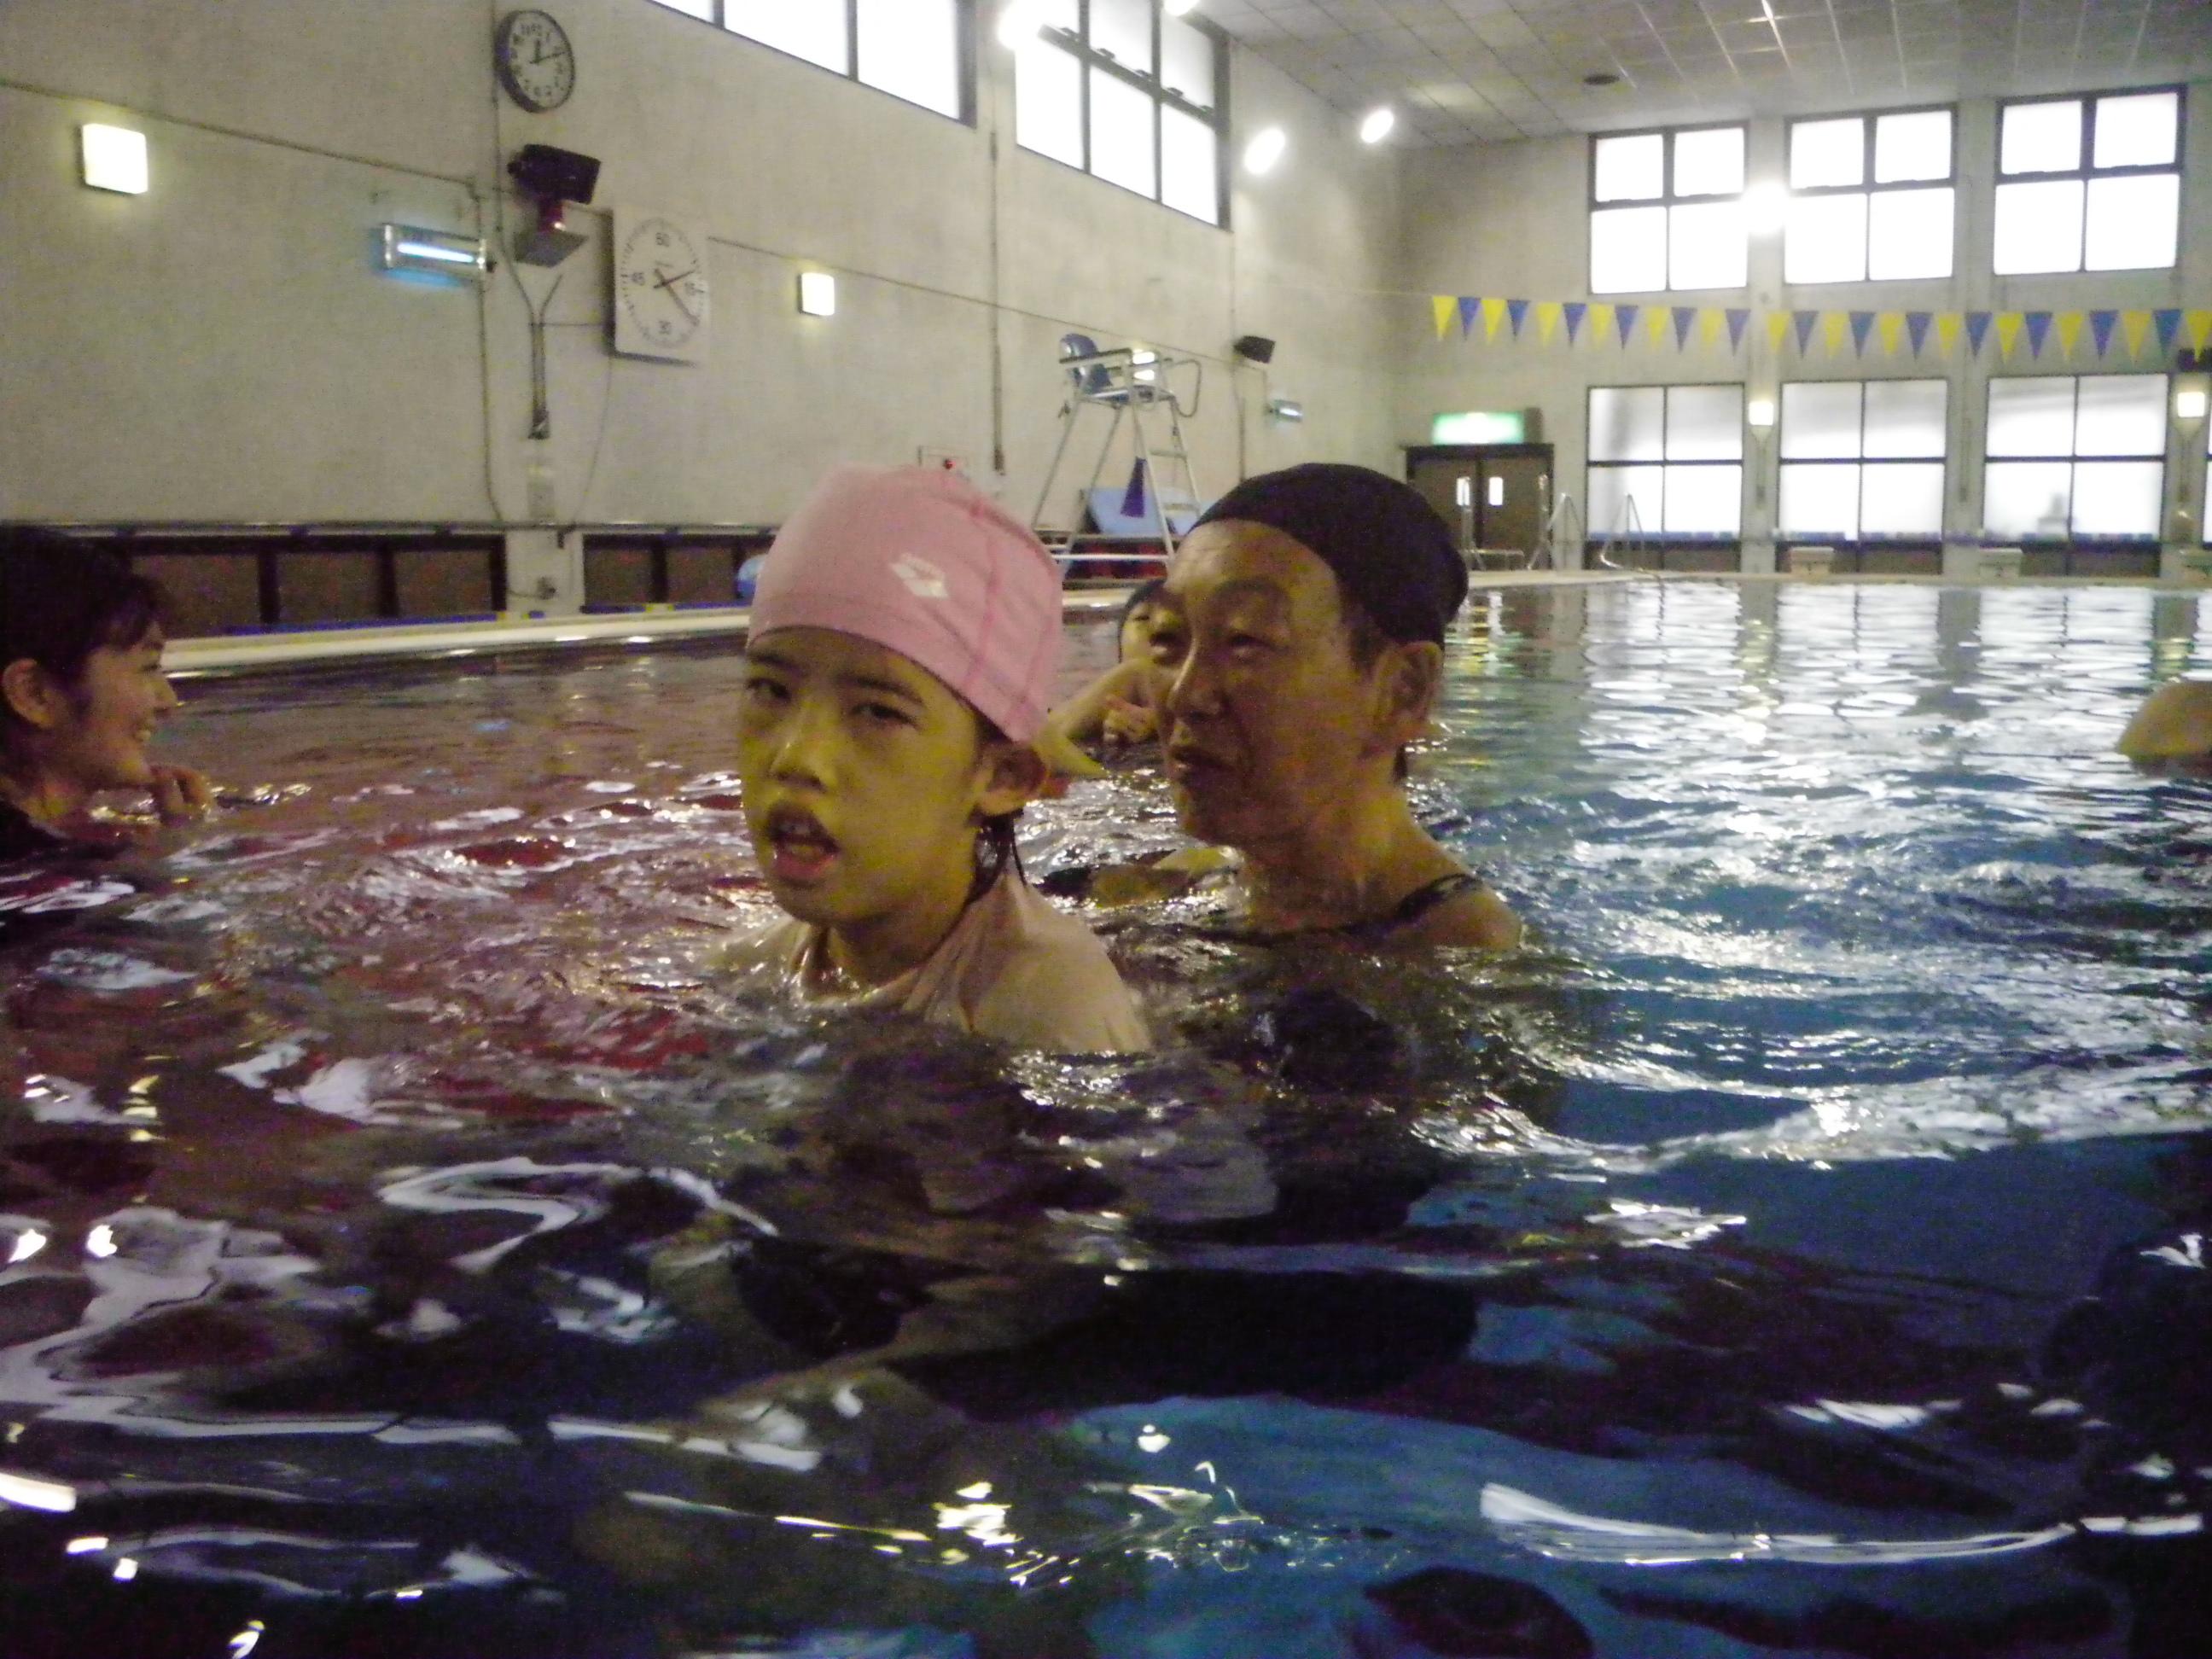 IMGP3048 - 寒い冬がやってきましたが、「重度障害者のプールのひろば」は毎月開催中!